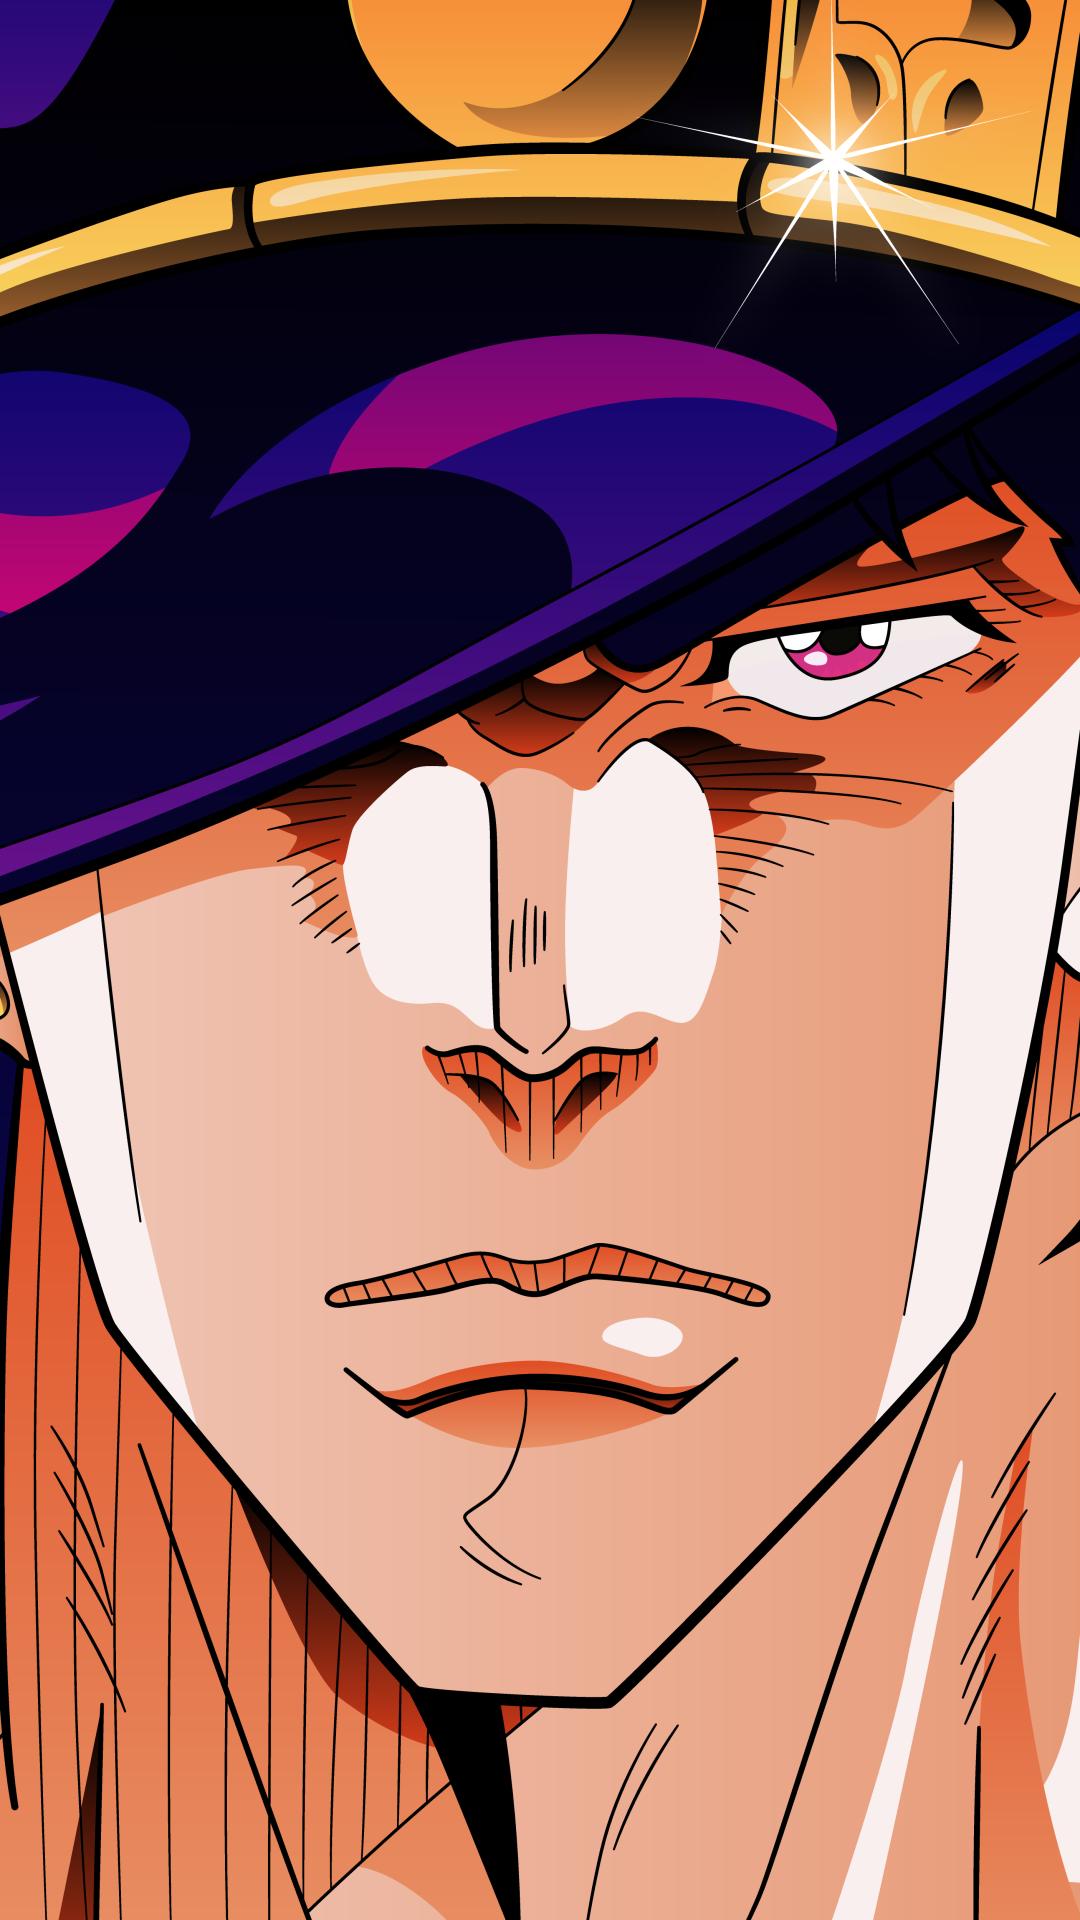 Imagen Relacionada Jojo S Bizarre Adventure Anime Jojos Bizarre Adventure Jotaro Jojo Bizzare Adventure